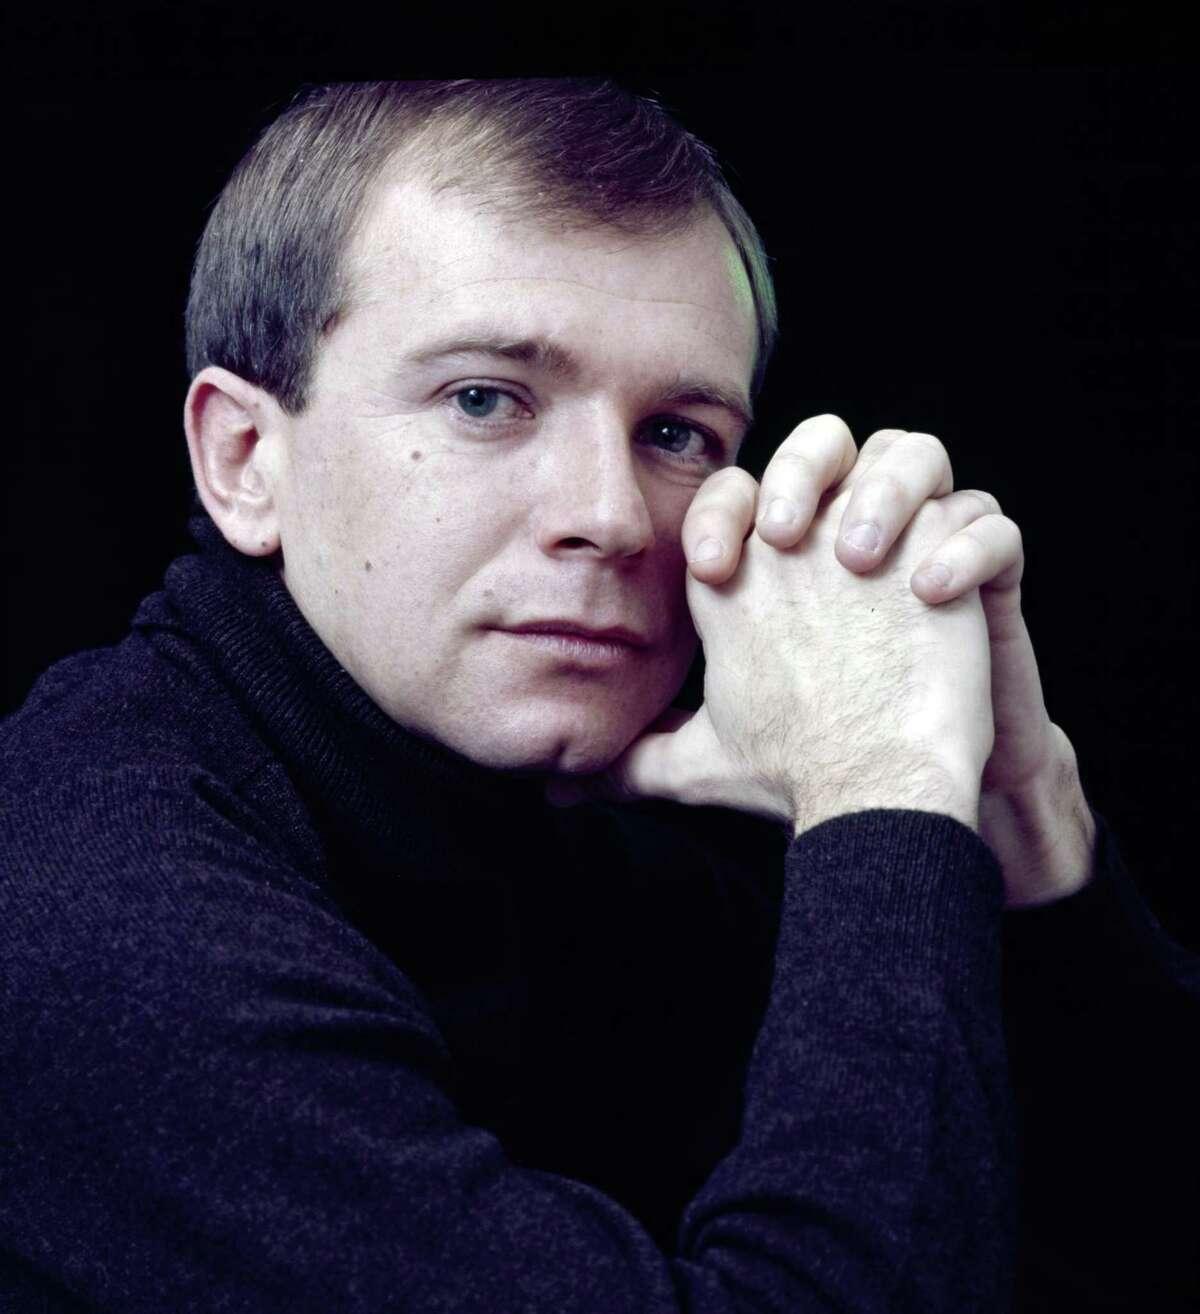 Tony award-winning playwright Terrence McNally photographed in 1974.